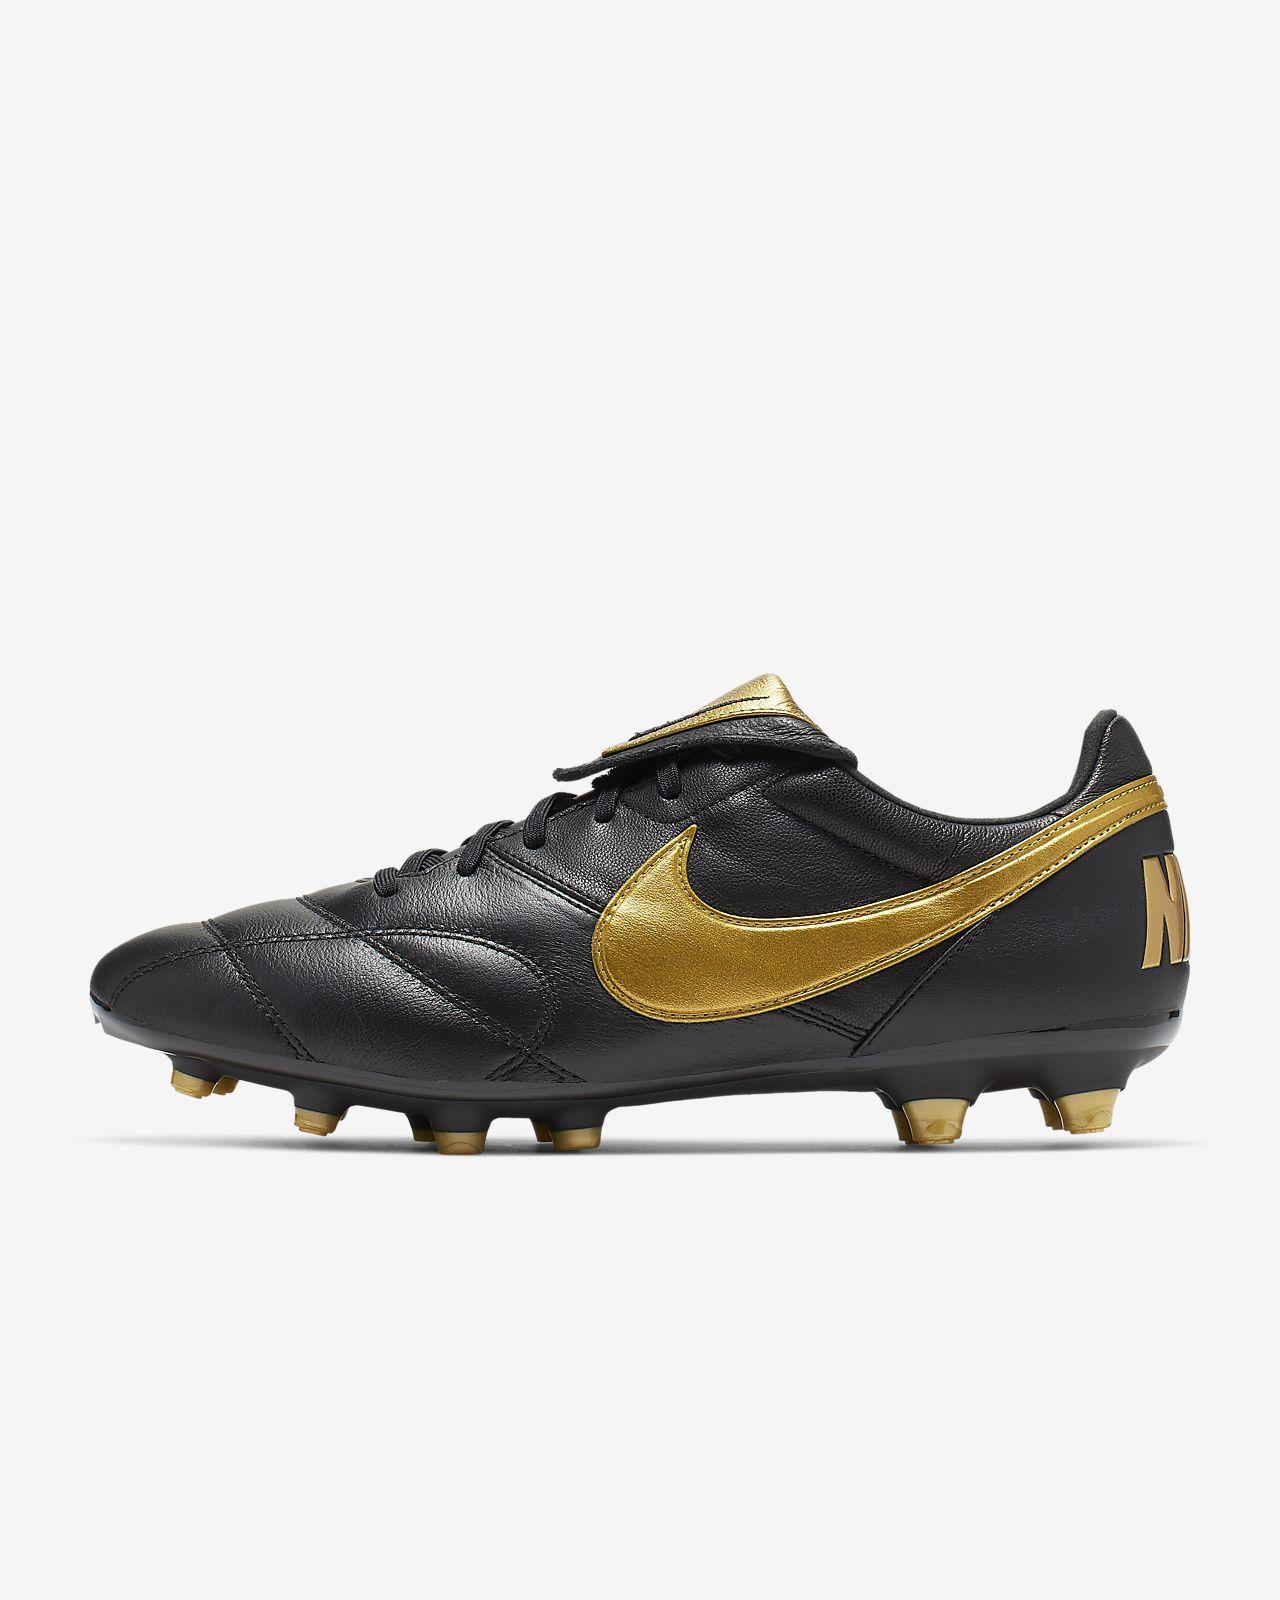 Scarpa Nike Terreni Per Fiyvb7gy6 Da Fgch Duri Ii Calcio Premier j4RL5A